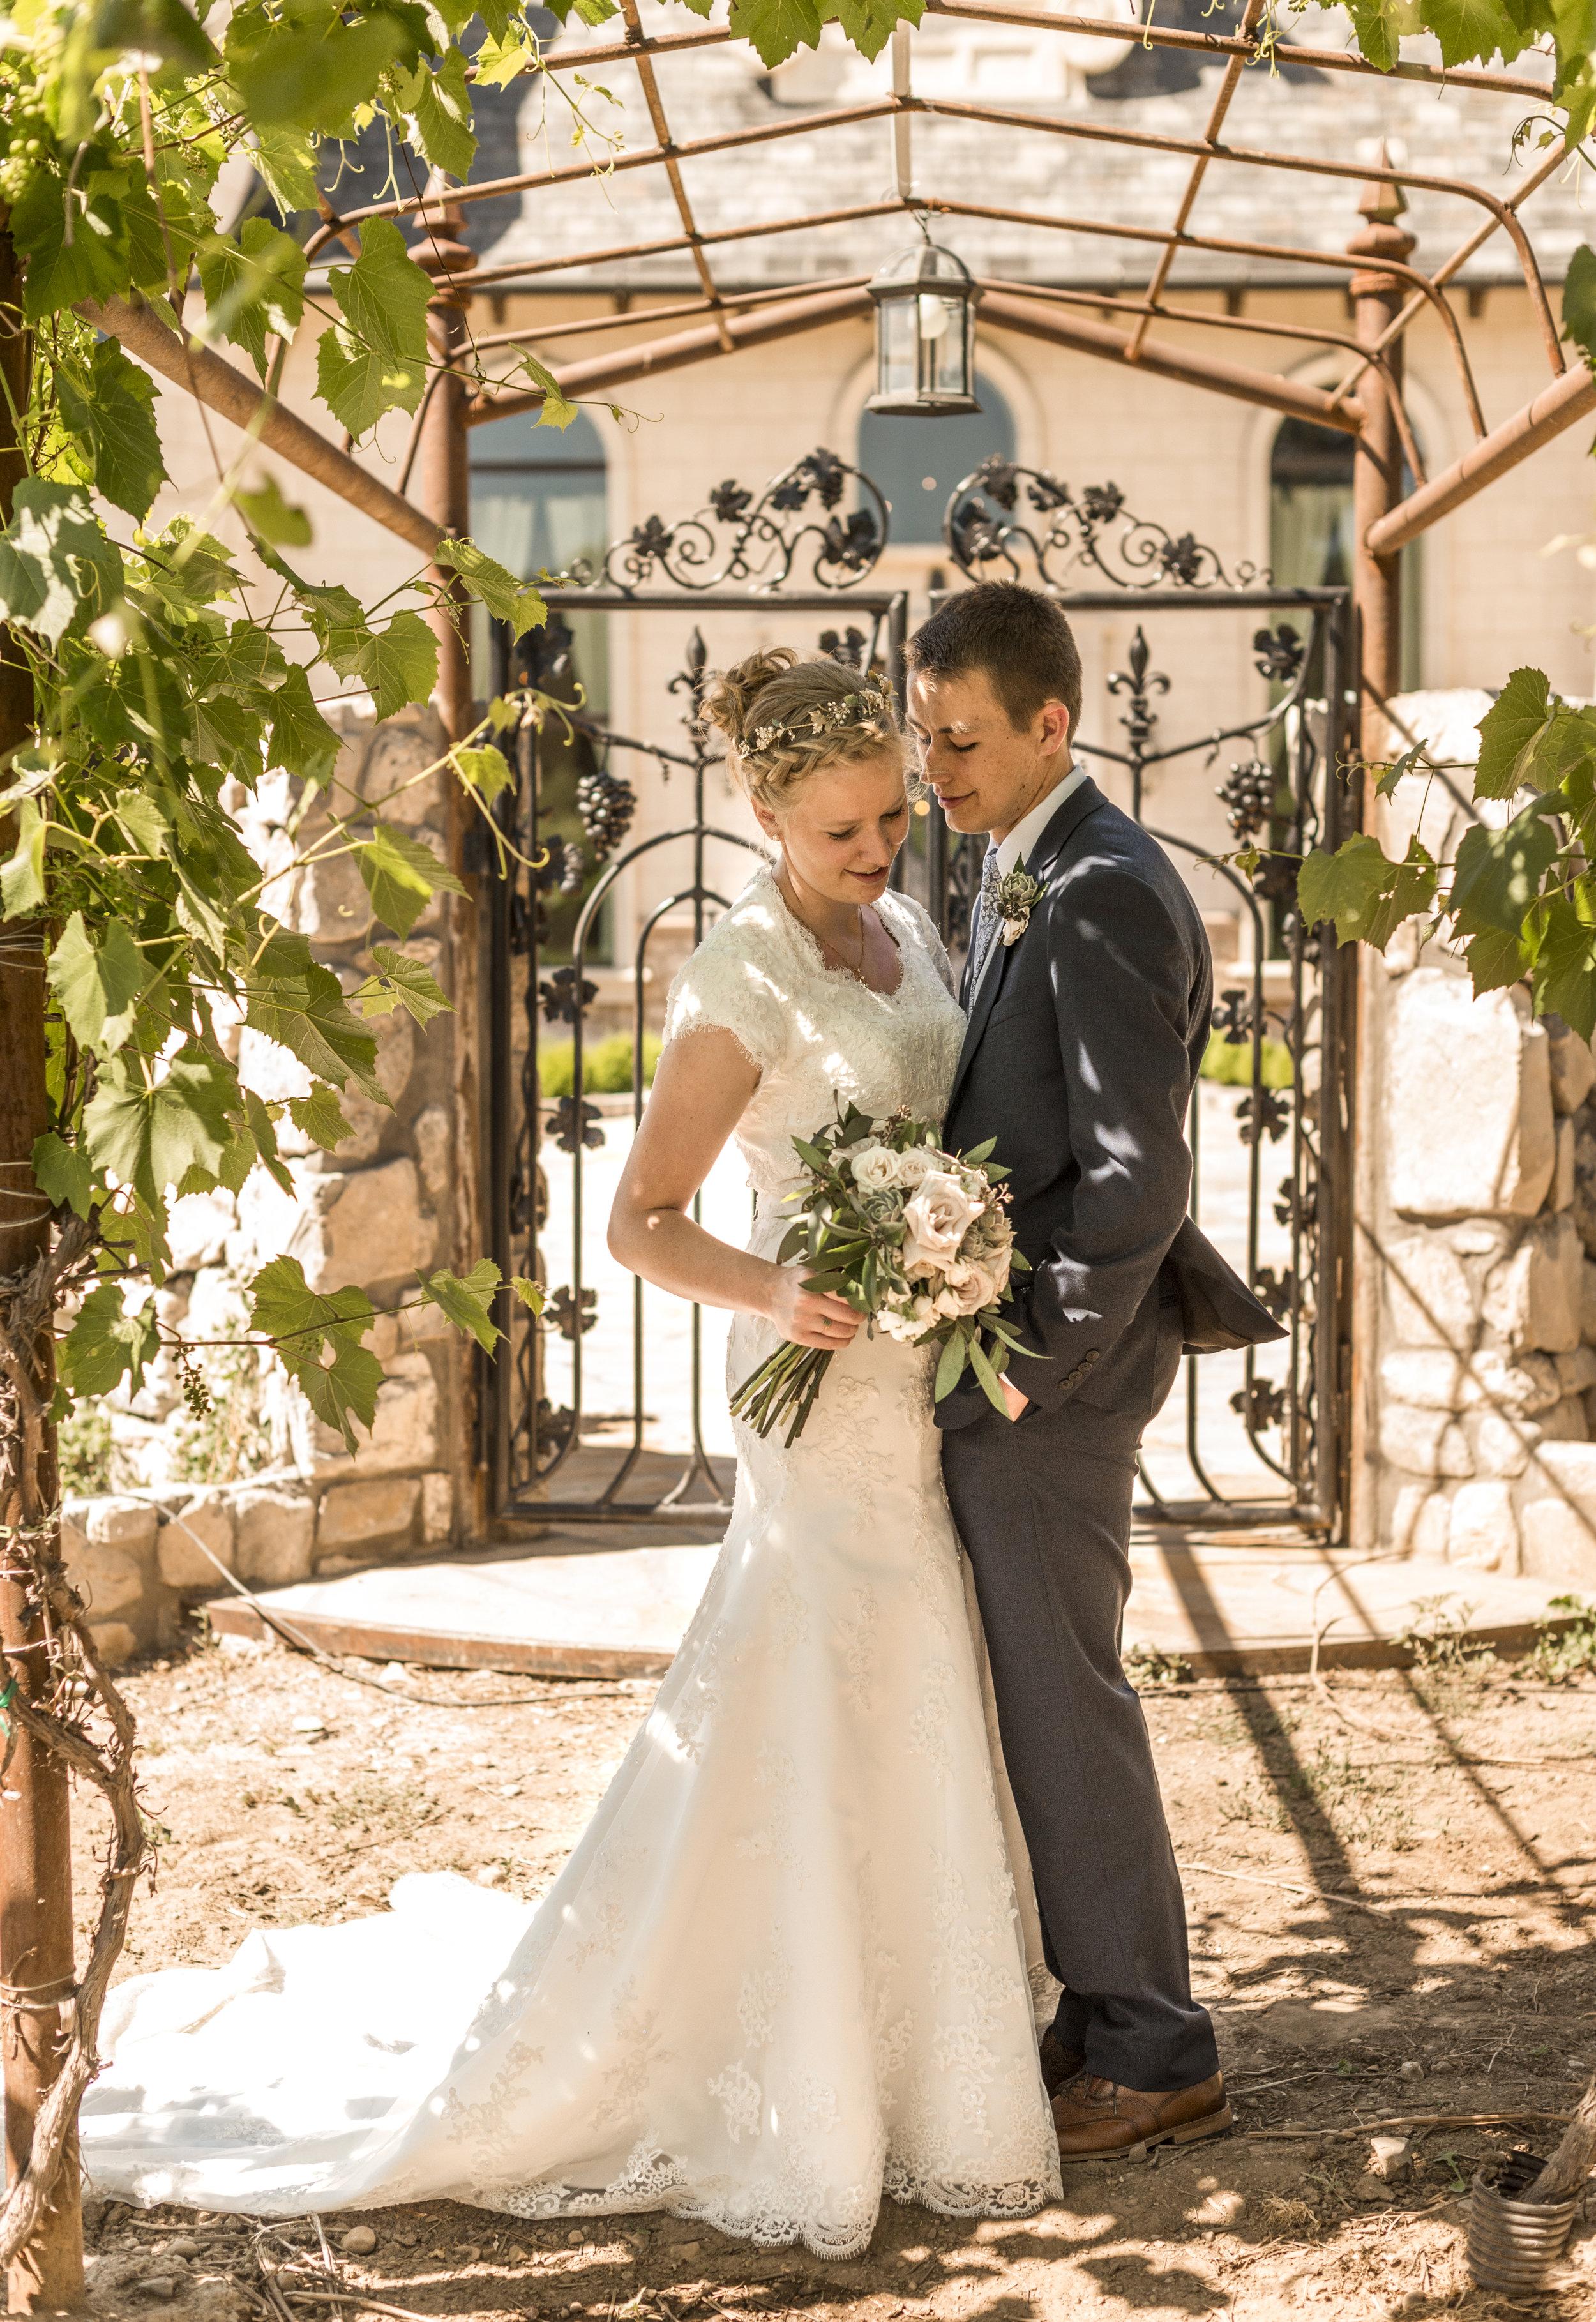 LDS Summer Wedding | Wadley Farm Lindon, Utah Wedding Photographer| Bri Bergman Photography 04.JPG